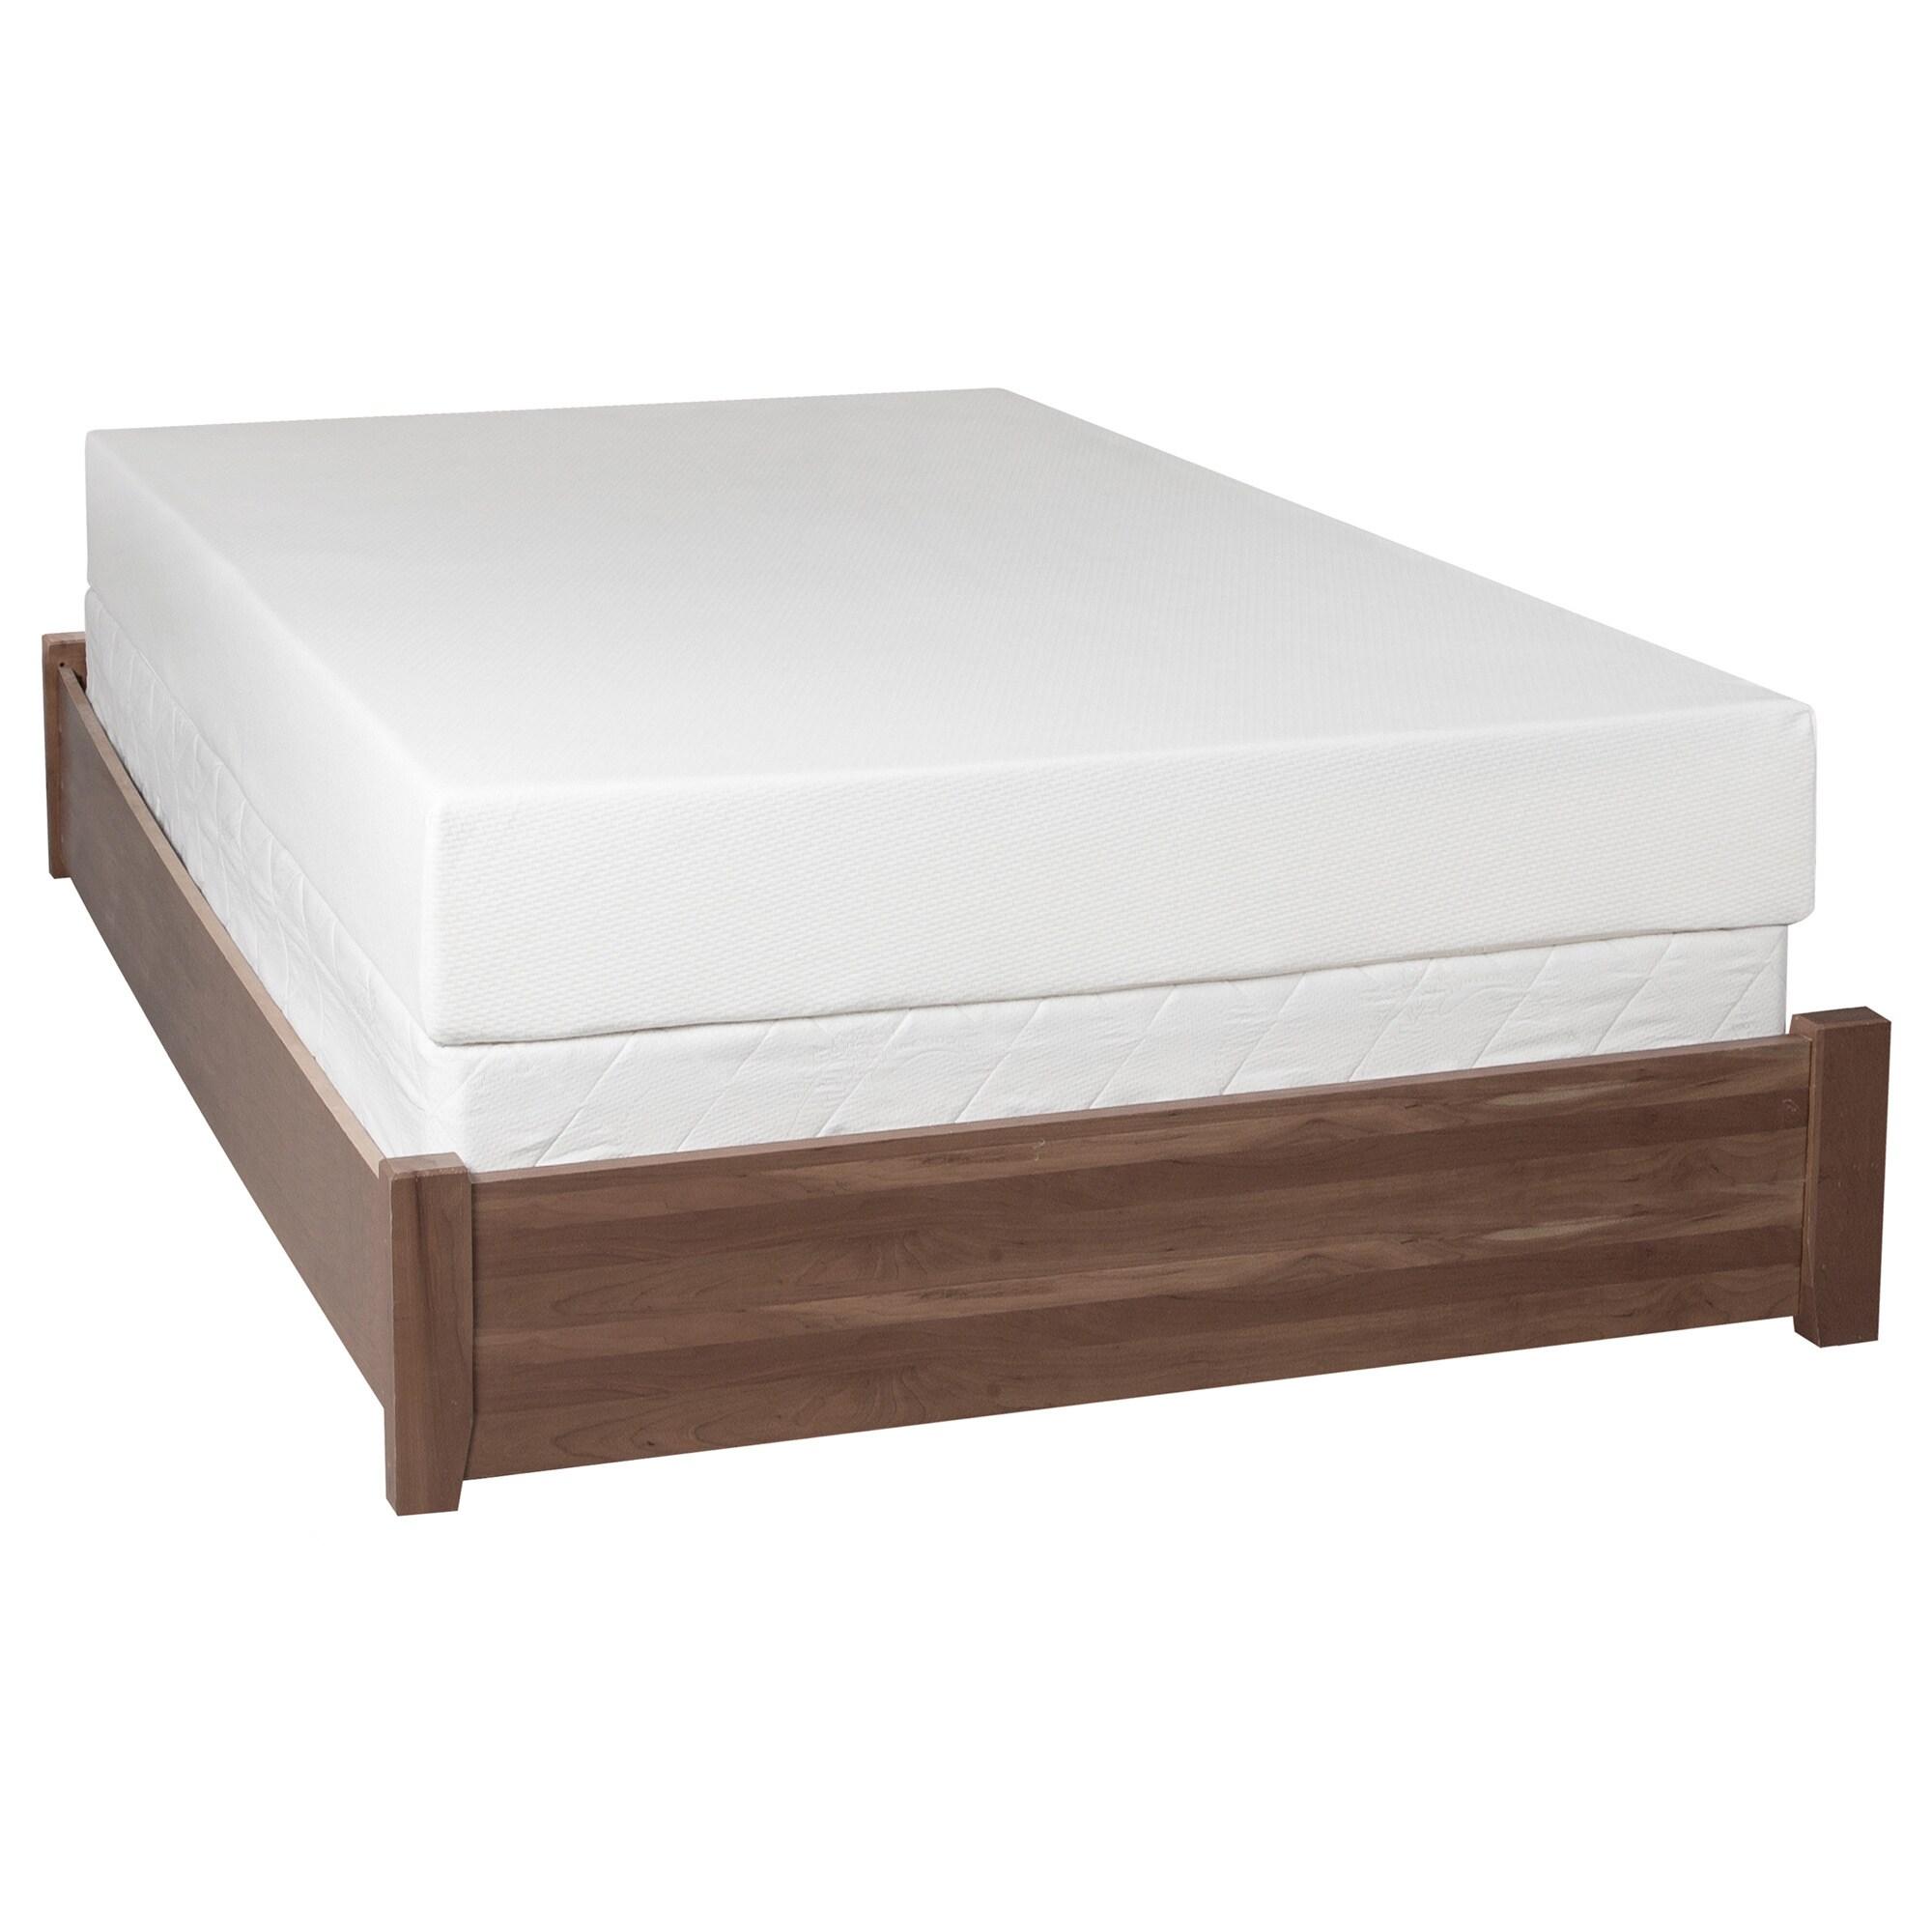 Select Luxury Home RV 8 inch Twin size Memory Foam